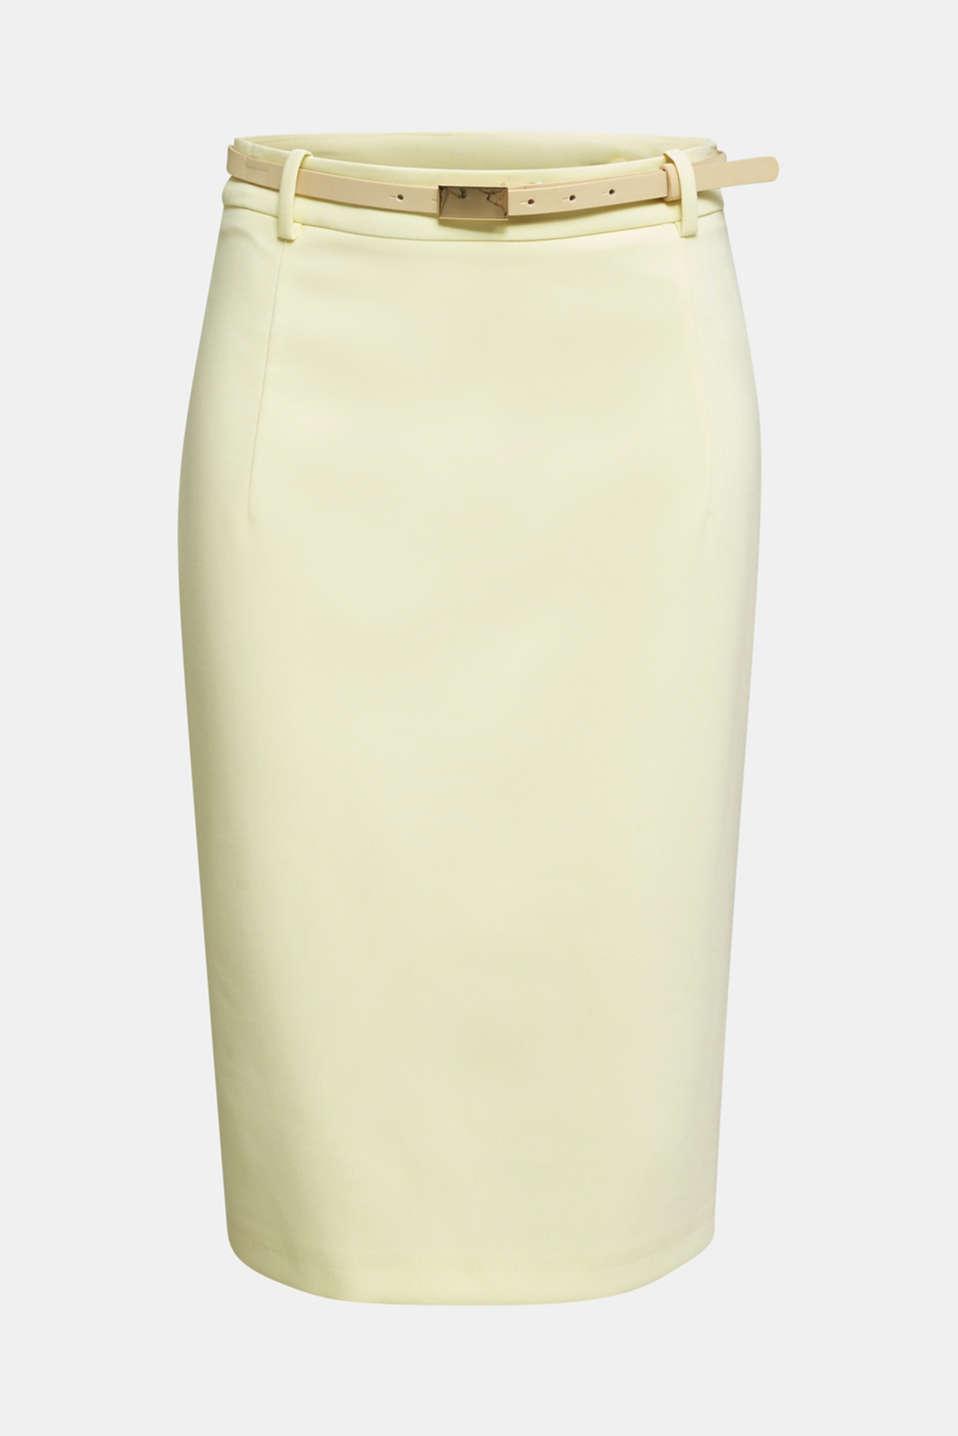 SUMMER BIZ mix + match skirt, LIME YELLOW, detail image number 7